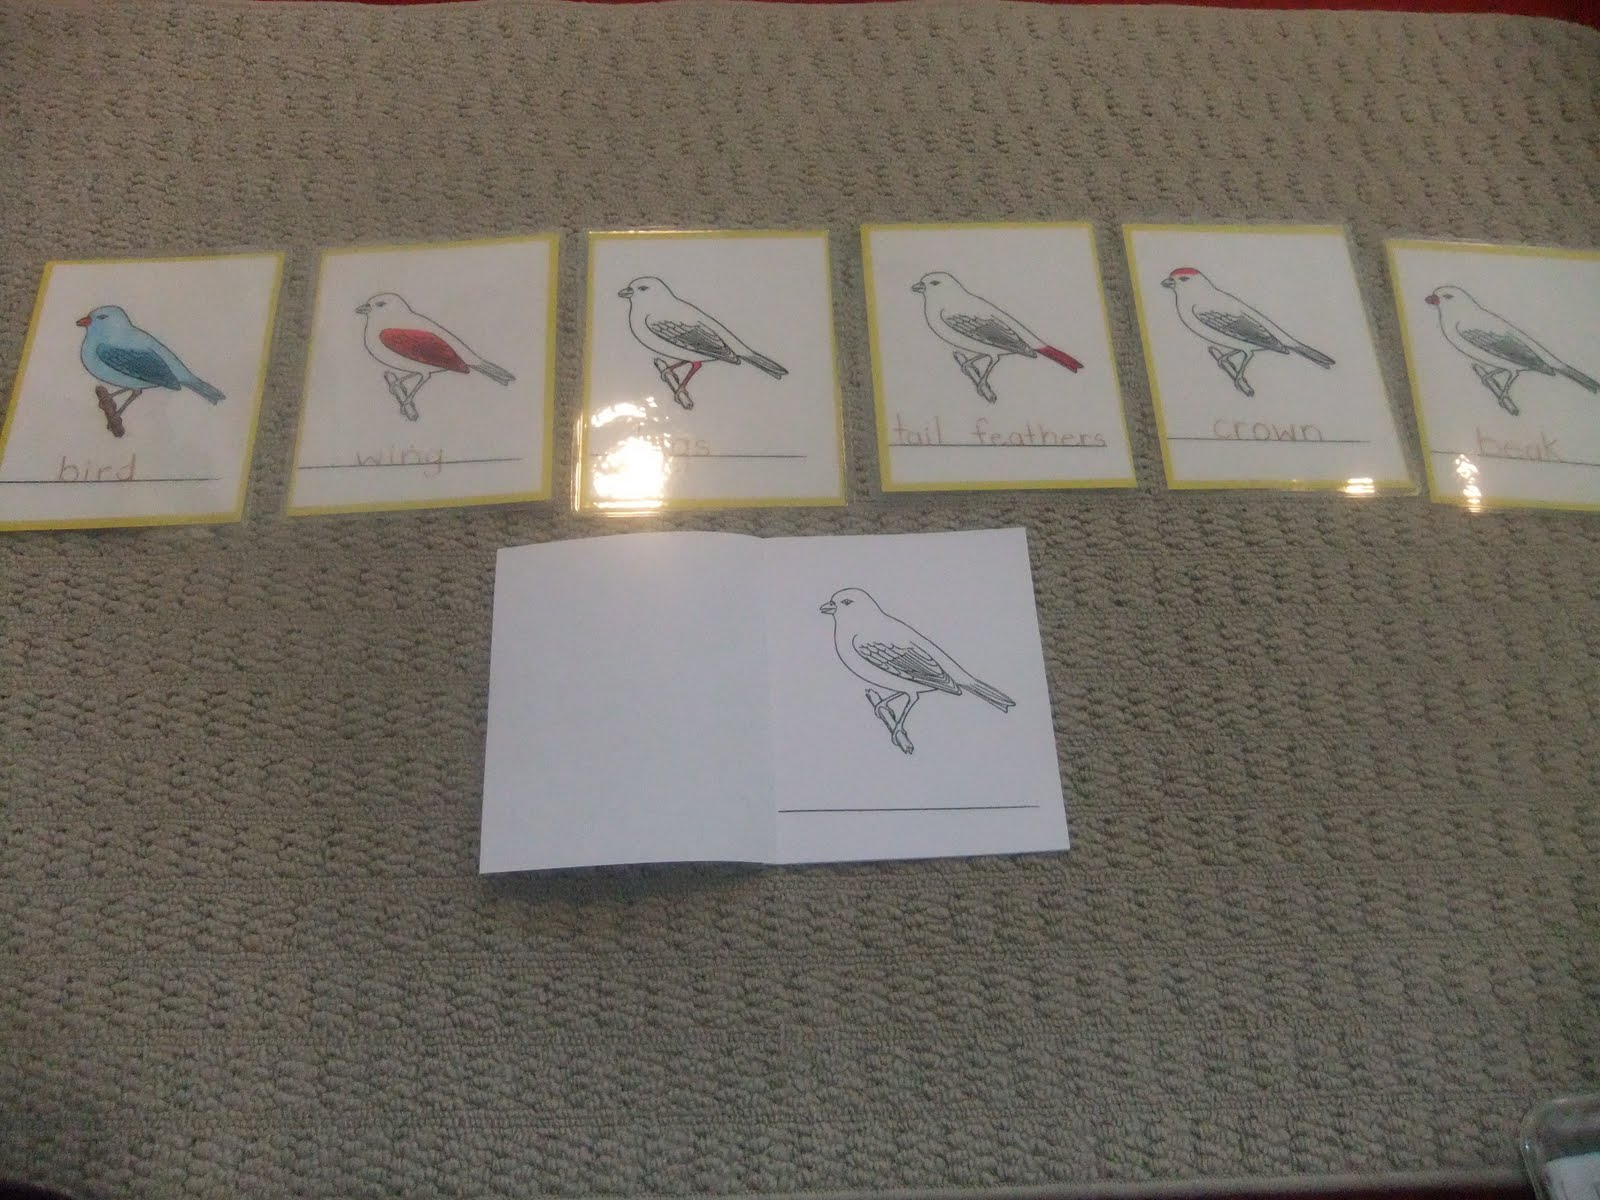 NAMC montessori preschool classroom activities learning about birds bird nomenclature